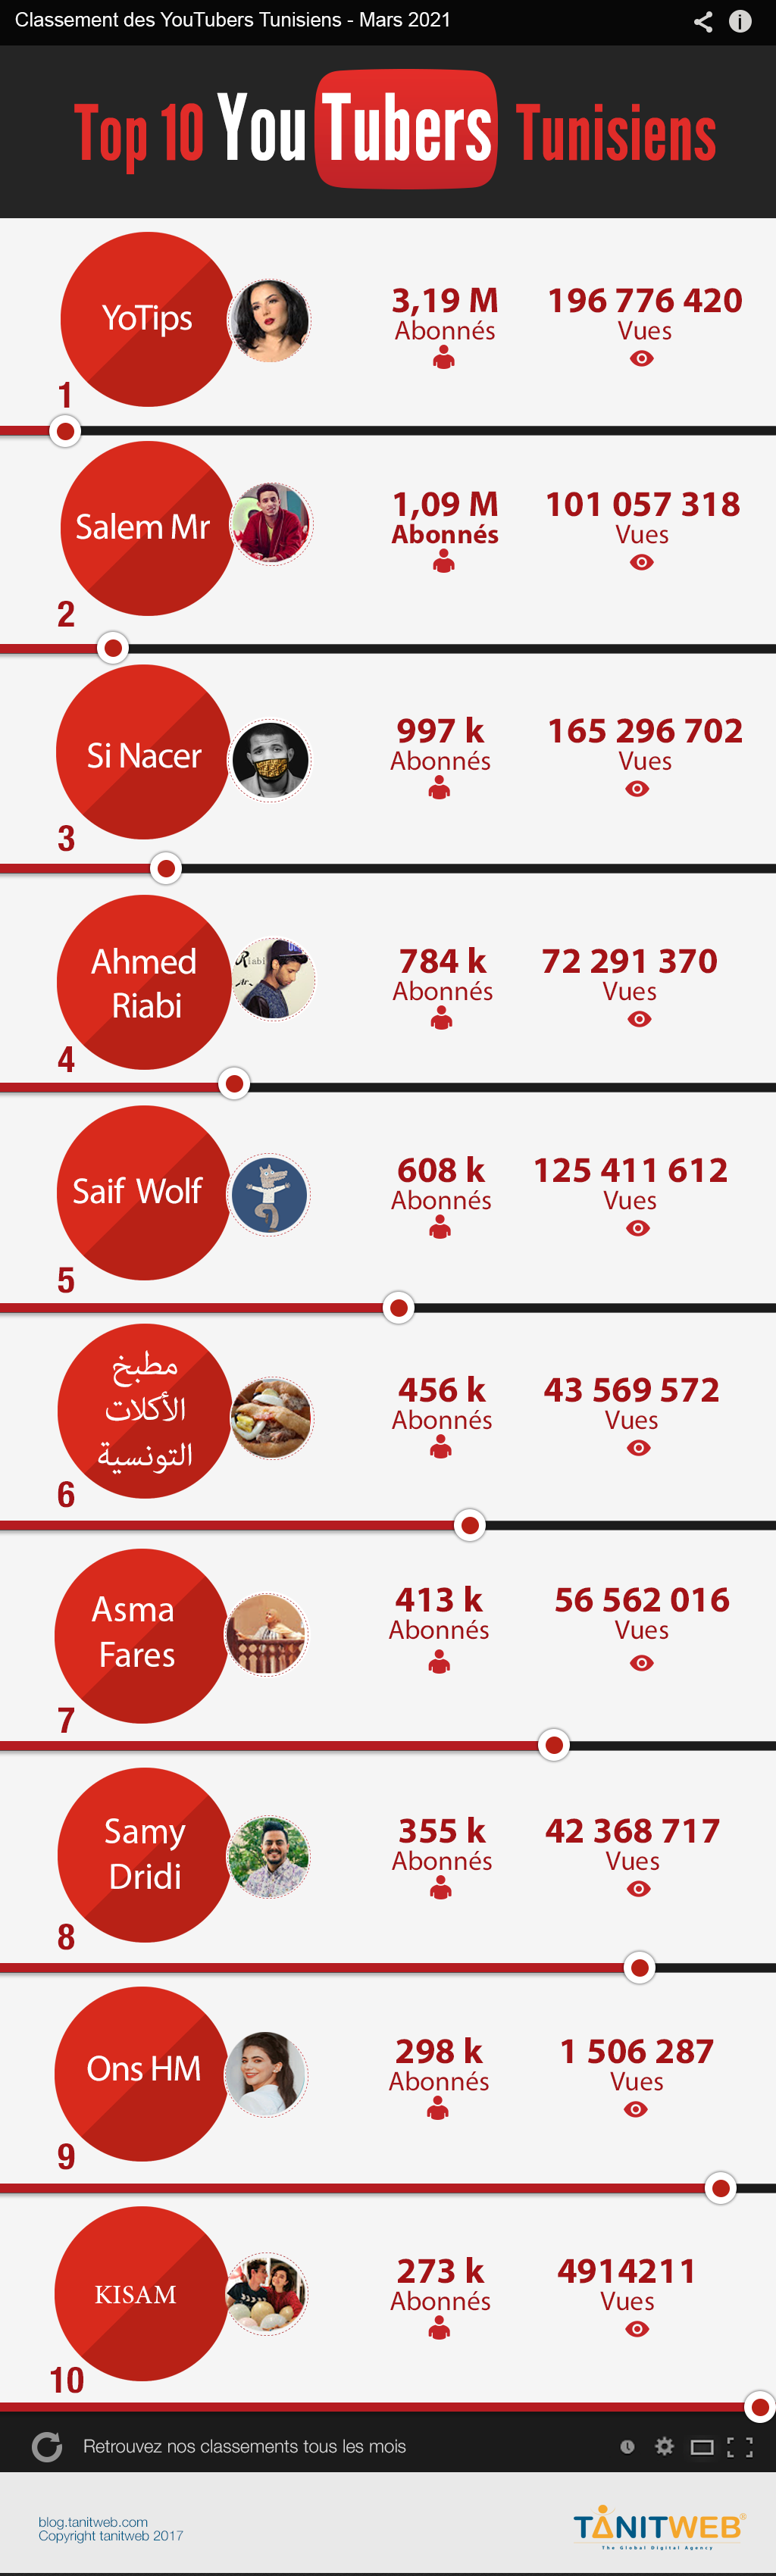 YouTubers-Tunisiens-mars-2021